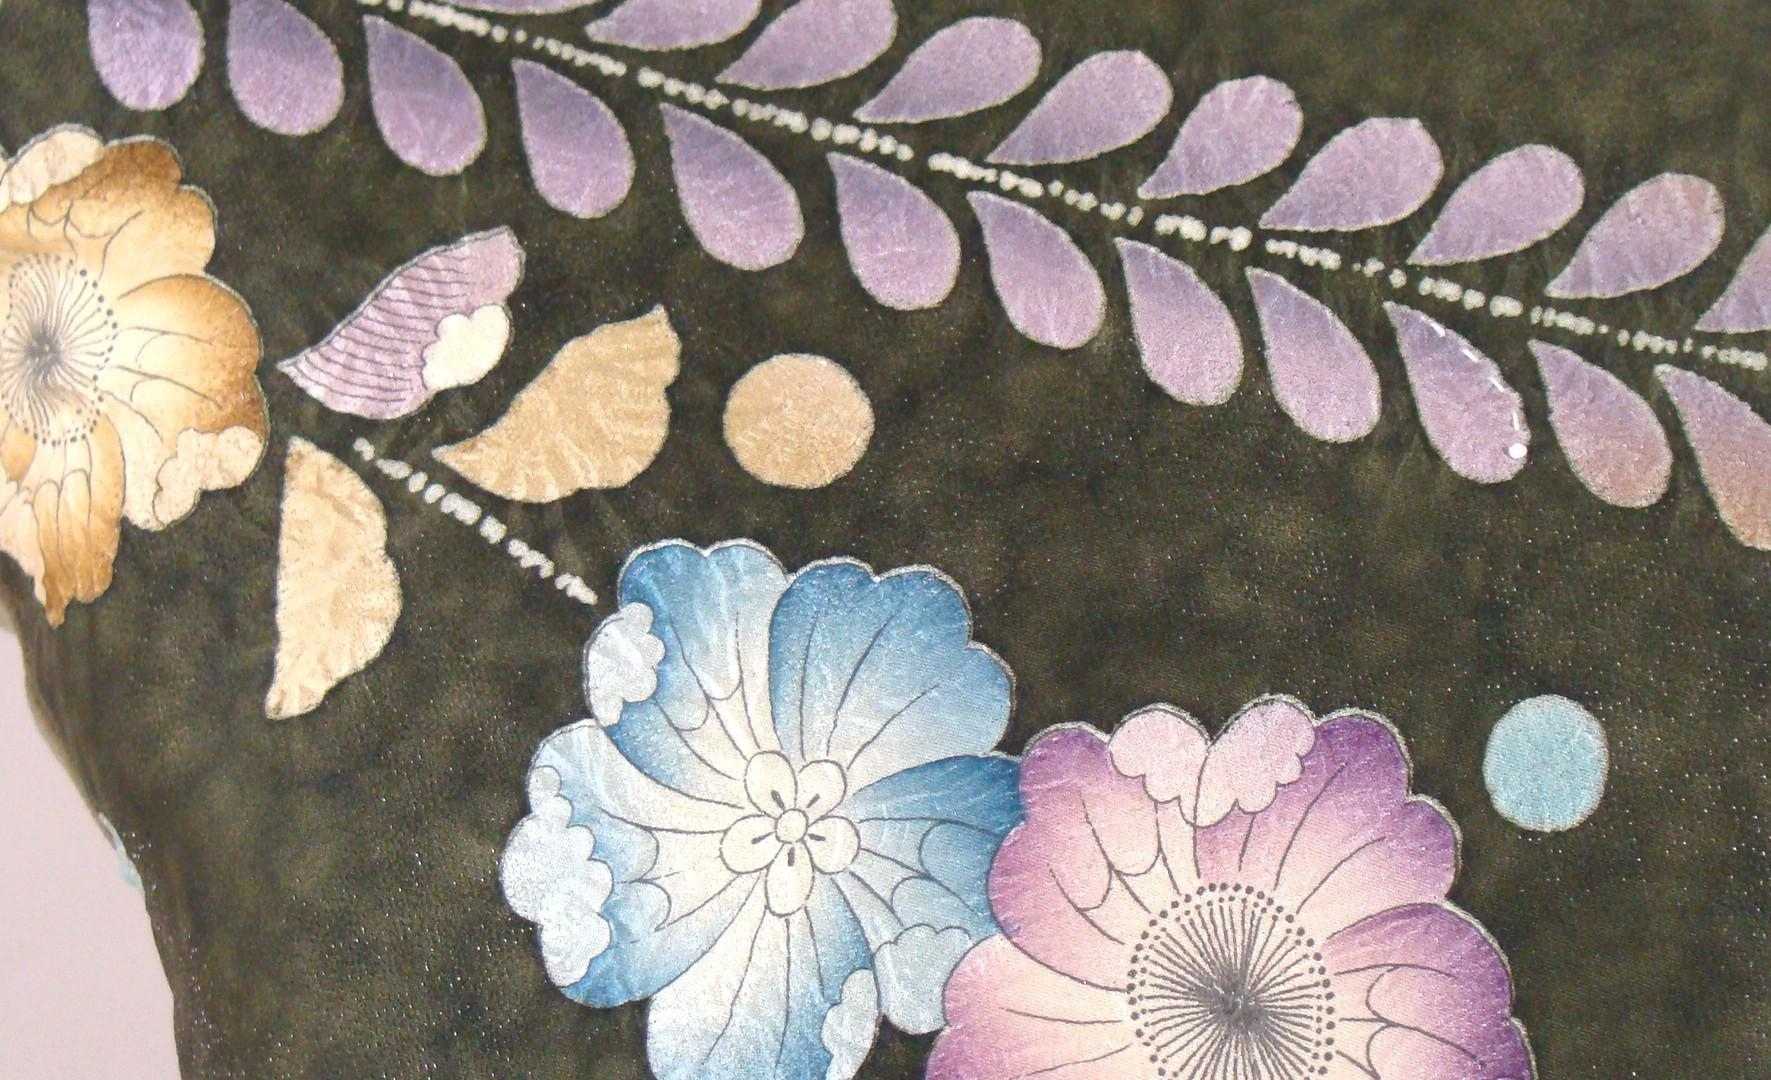 Olive Green Japanese Tsujigahana Silk Kimono Pillow Cover Fits 16 x 20 Pillow Insert